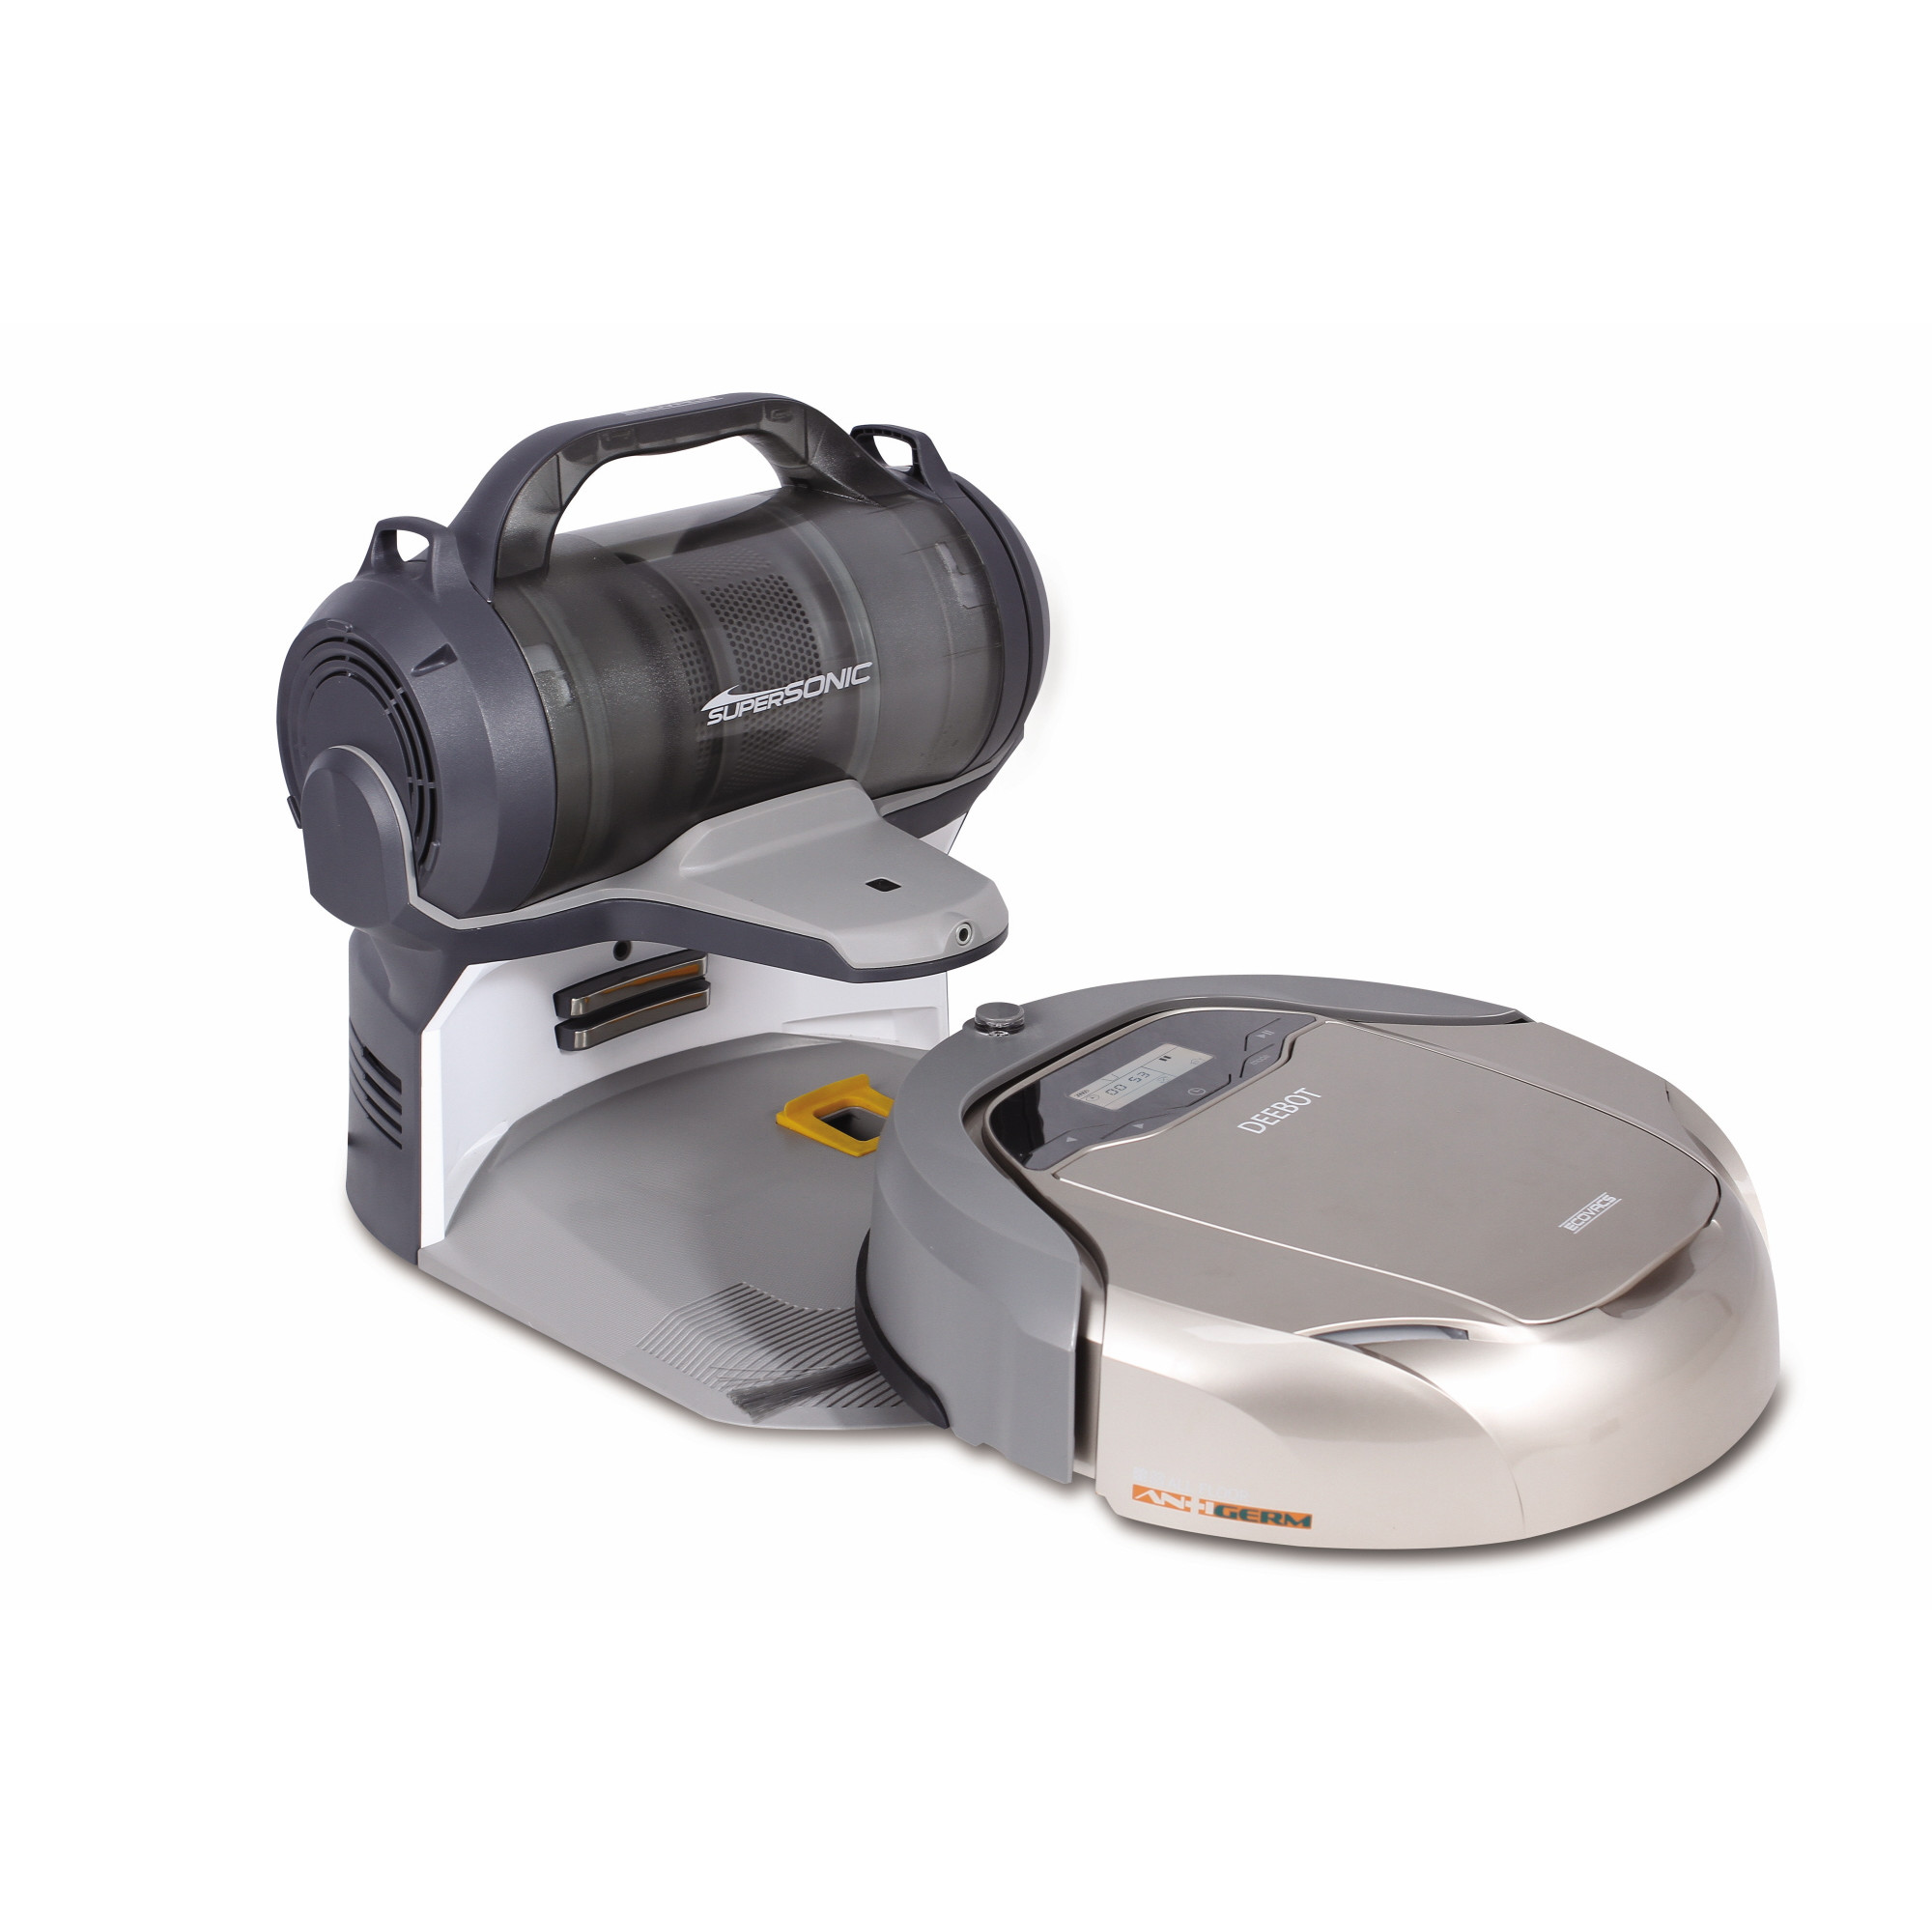 aspirateur robot ecovacs deebot d77 bestofrobots. Black Bedroom Furniture Sets. Home Design Ideas